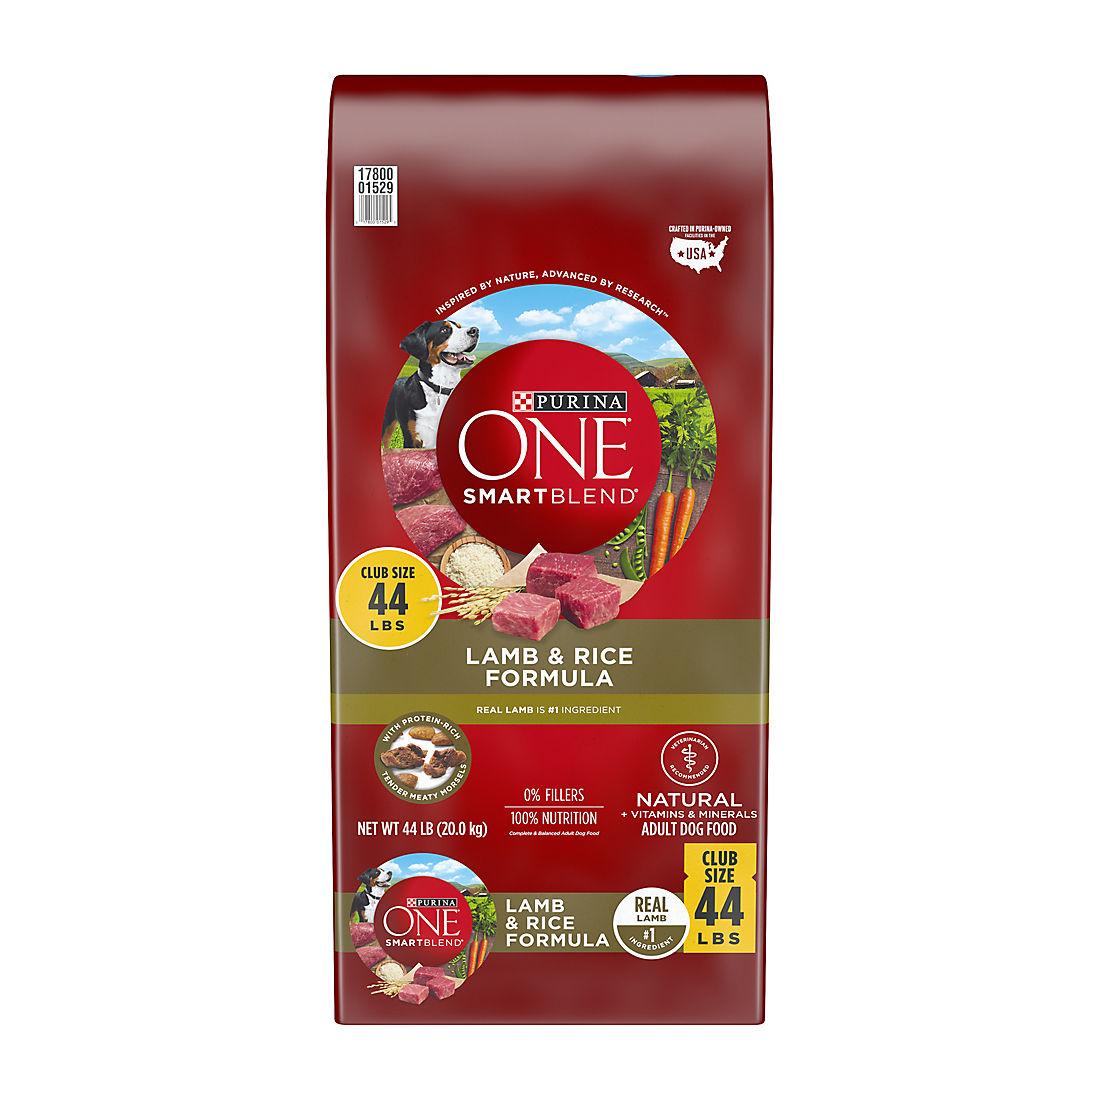 Purina One Smartblend Lamb Amp Rice Formula Adult Premium Dog Food Bjs Wholesale Club